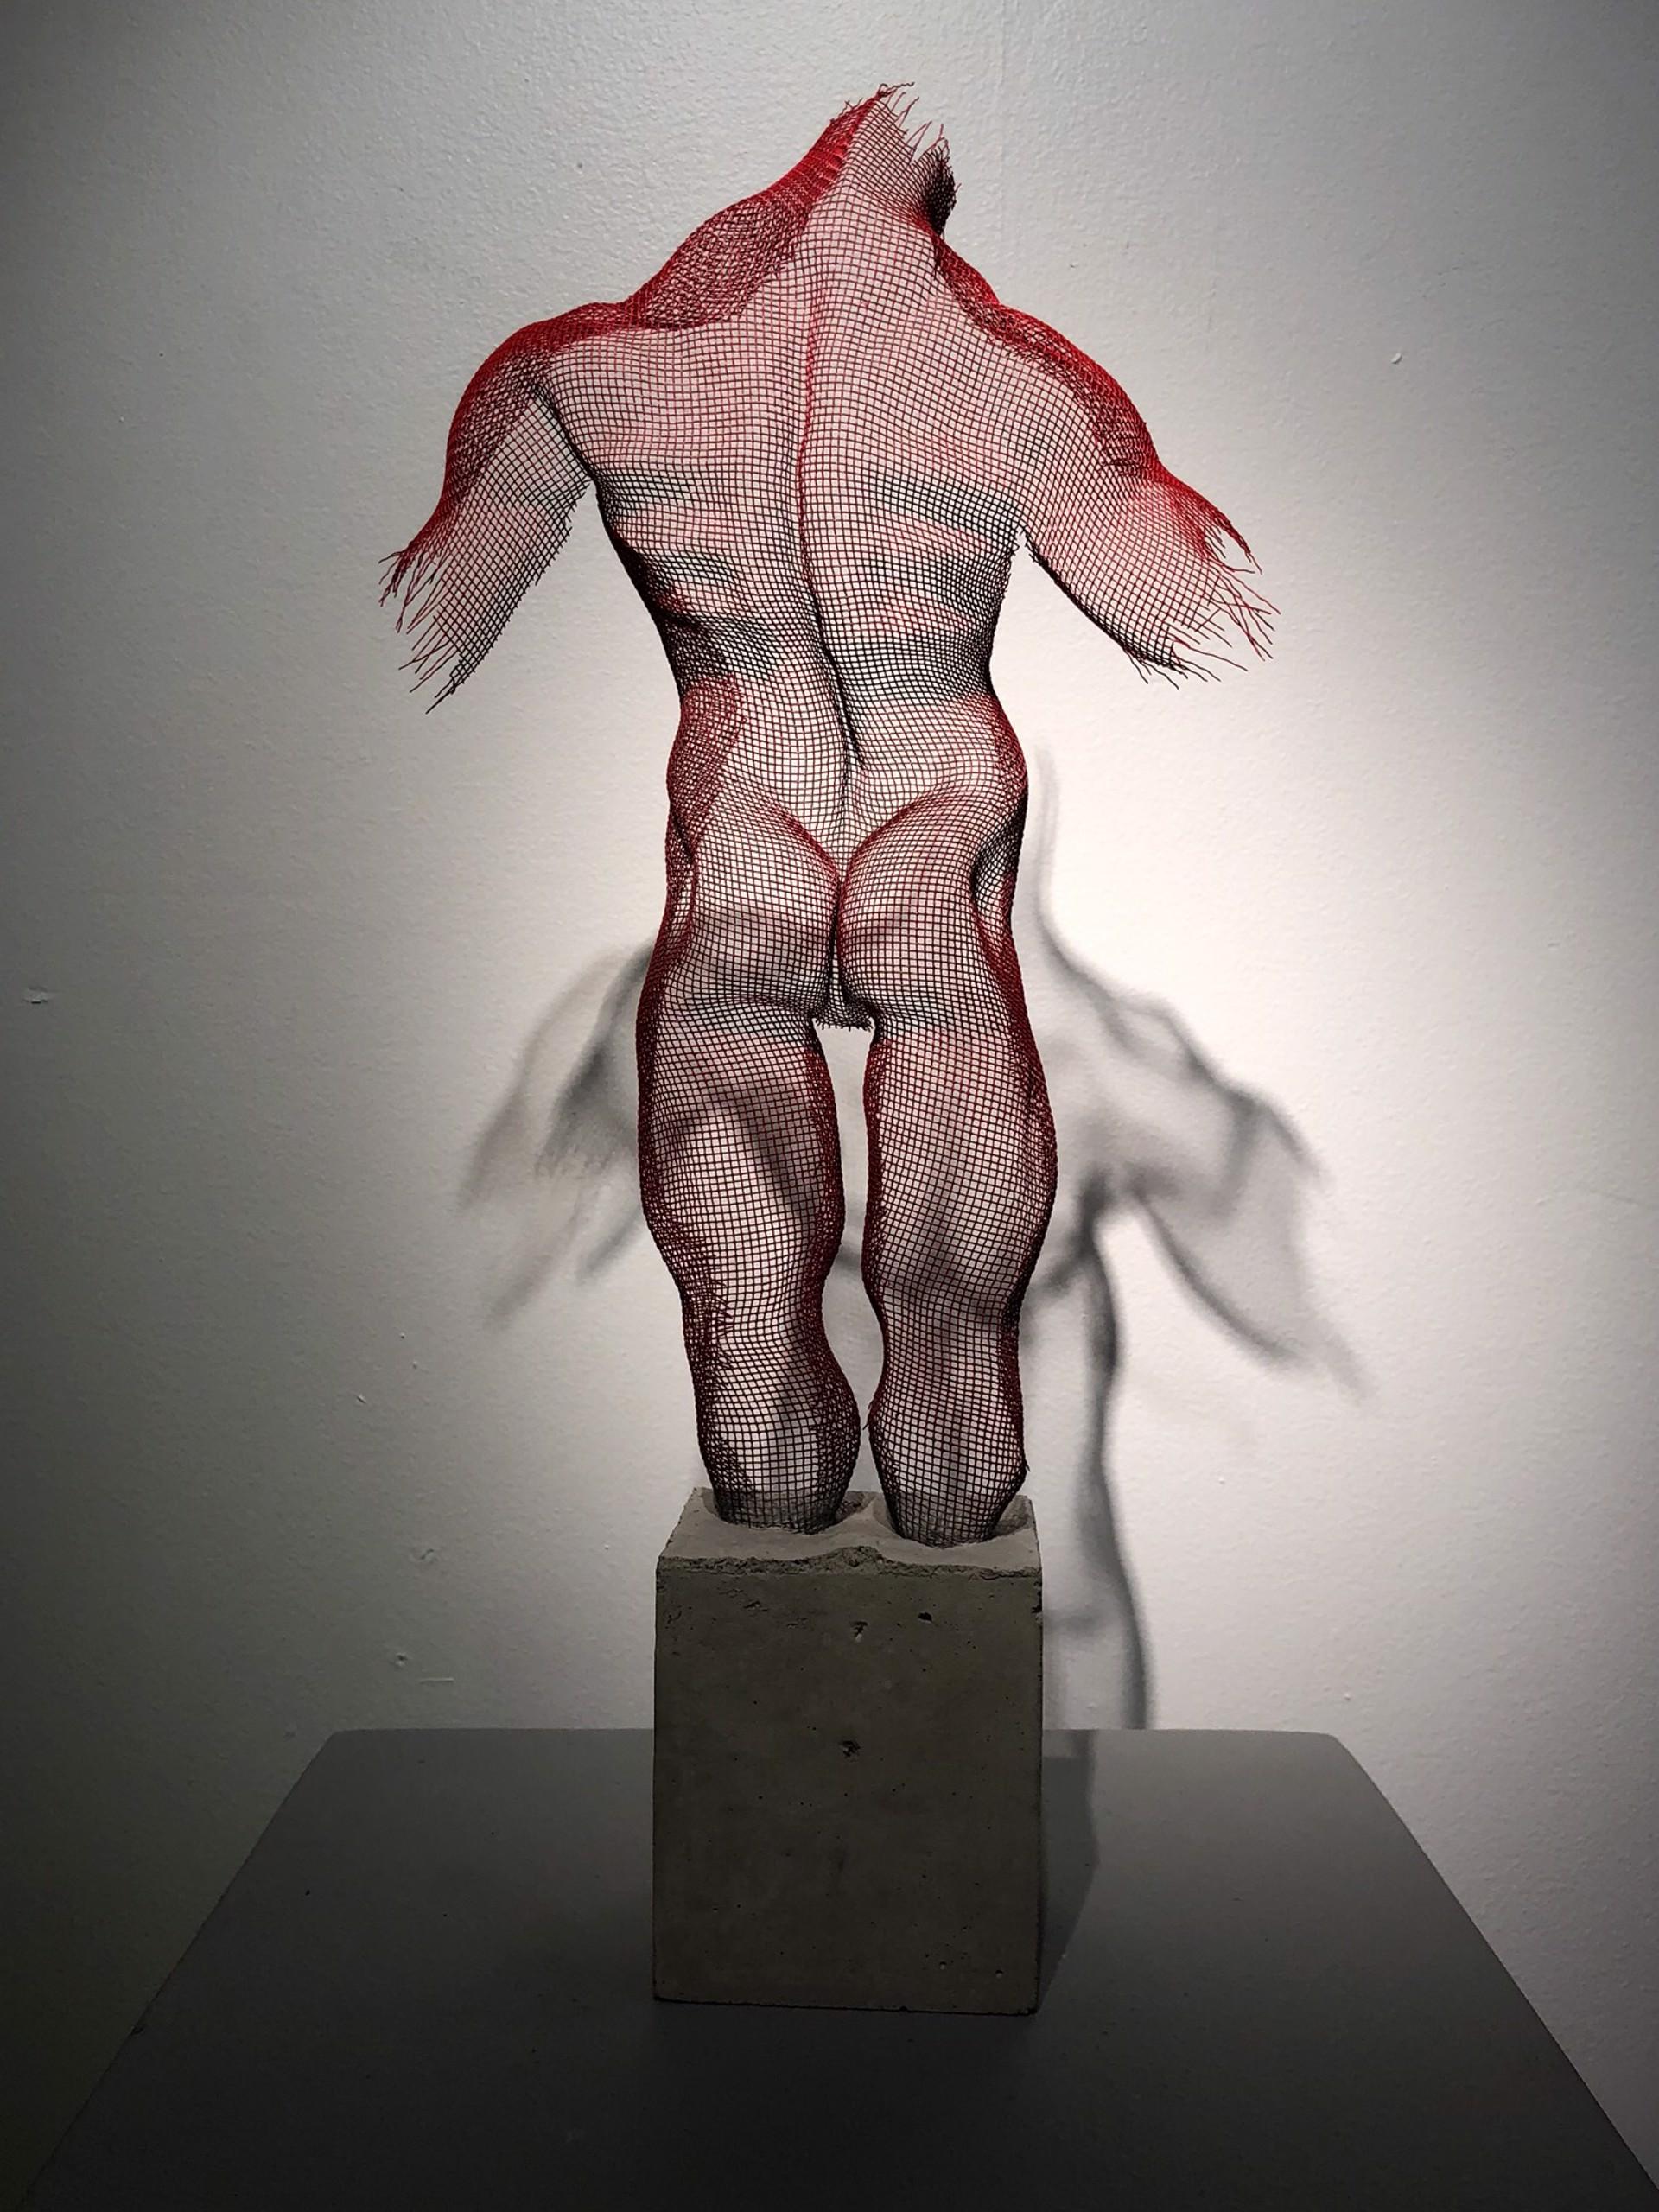 Shadow Sculpture by Ofer Rubin